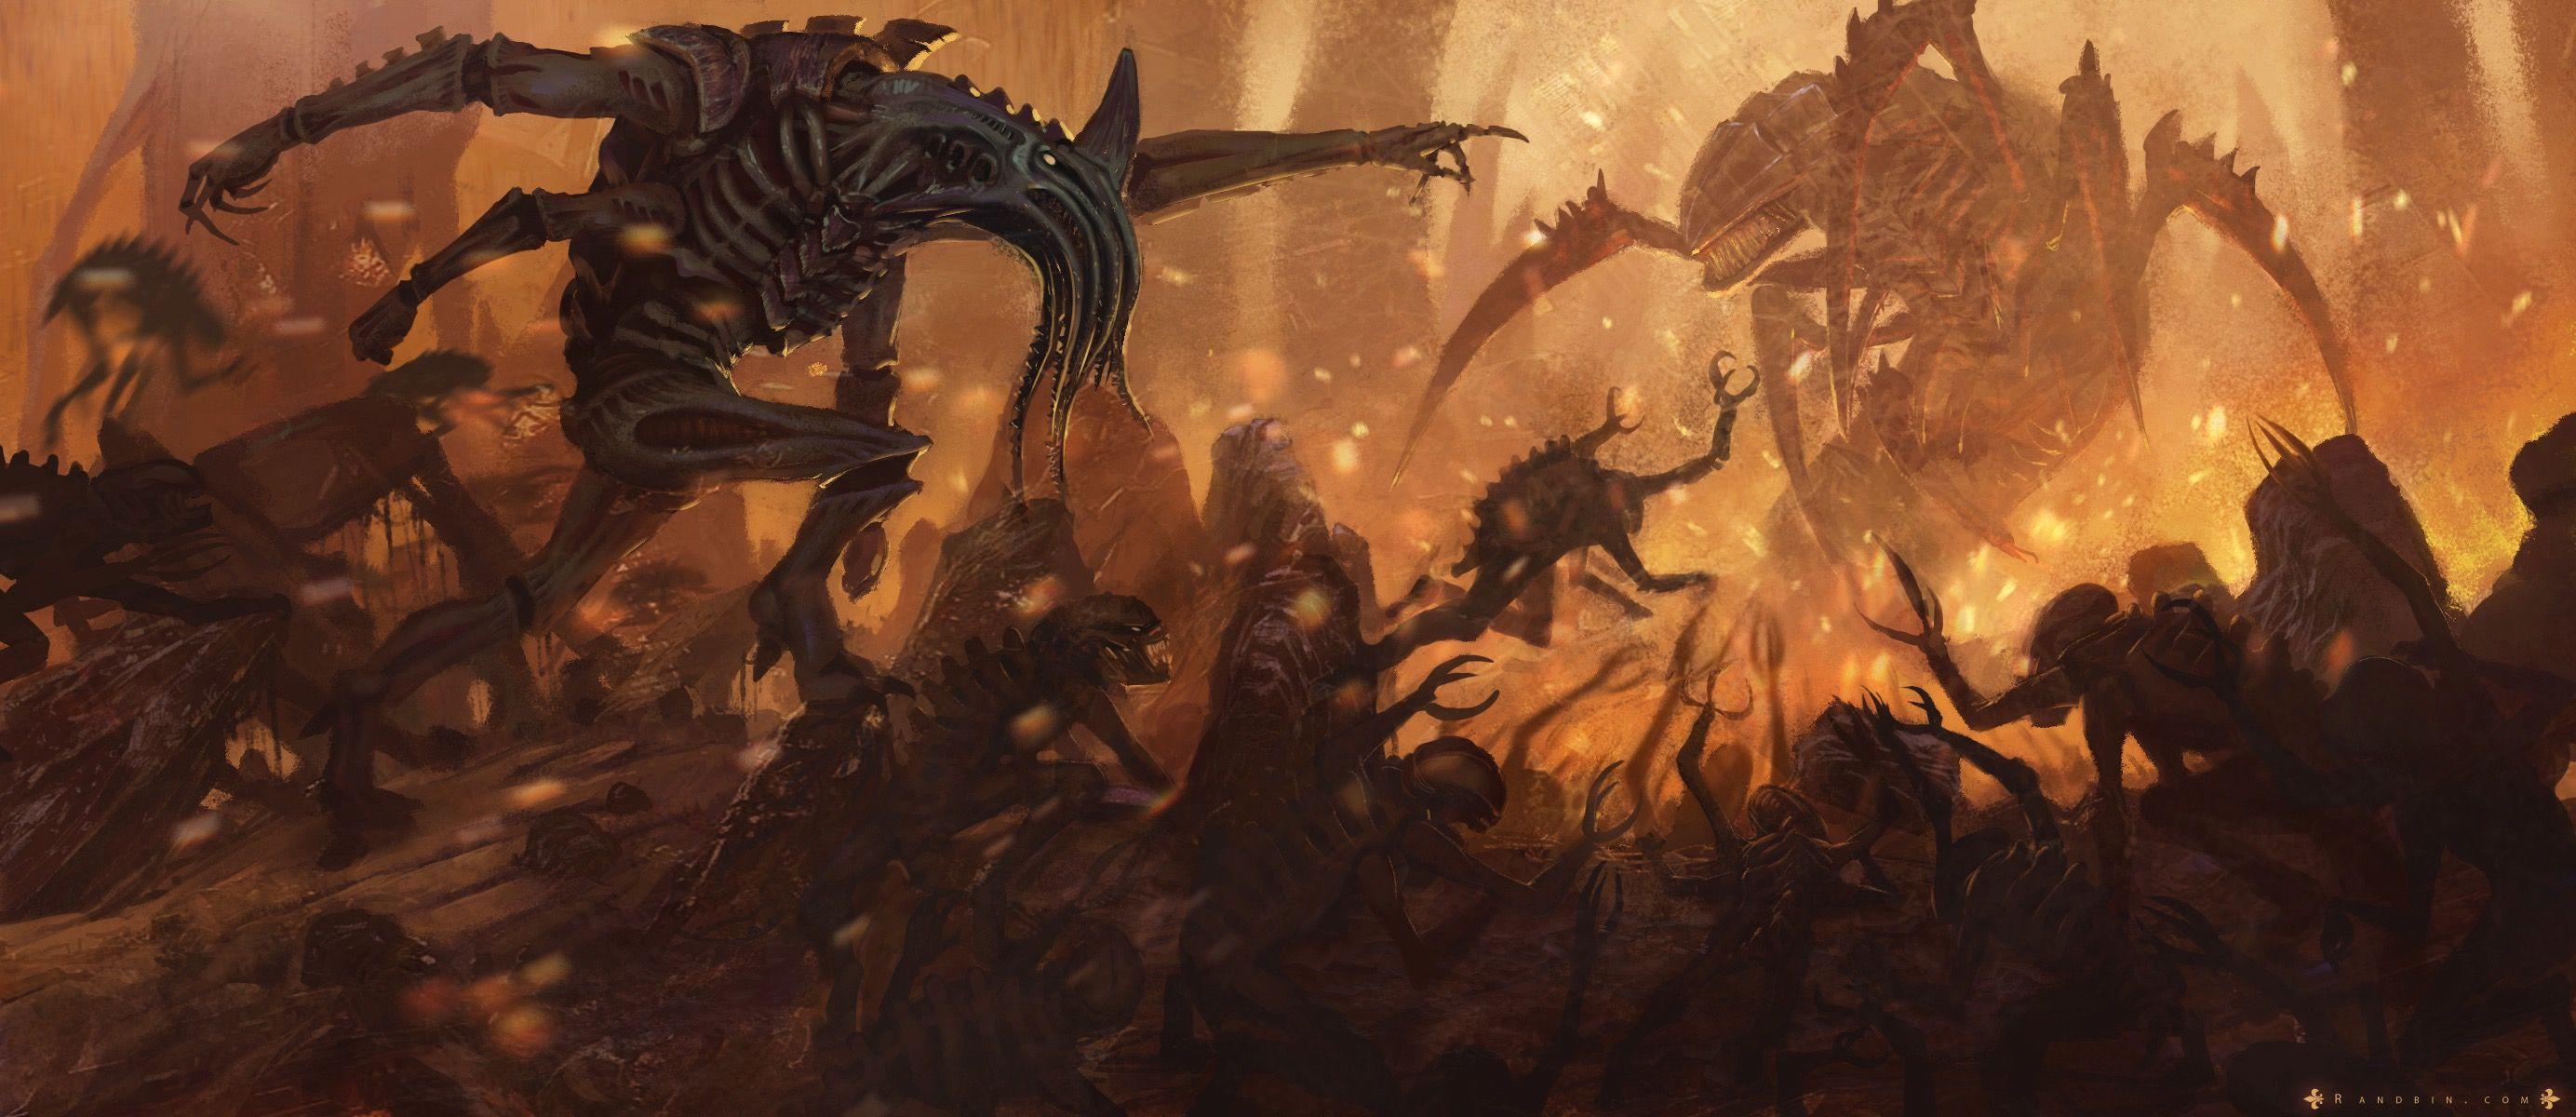 Tyranids Warhammer 40k Warhammer 40k Tyranids Tyranids